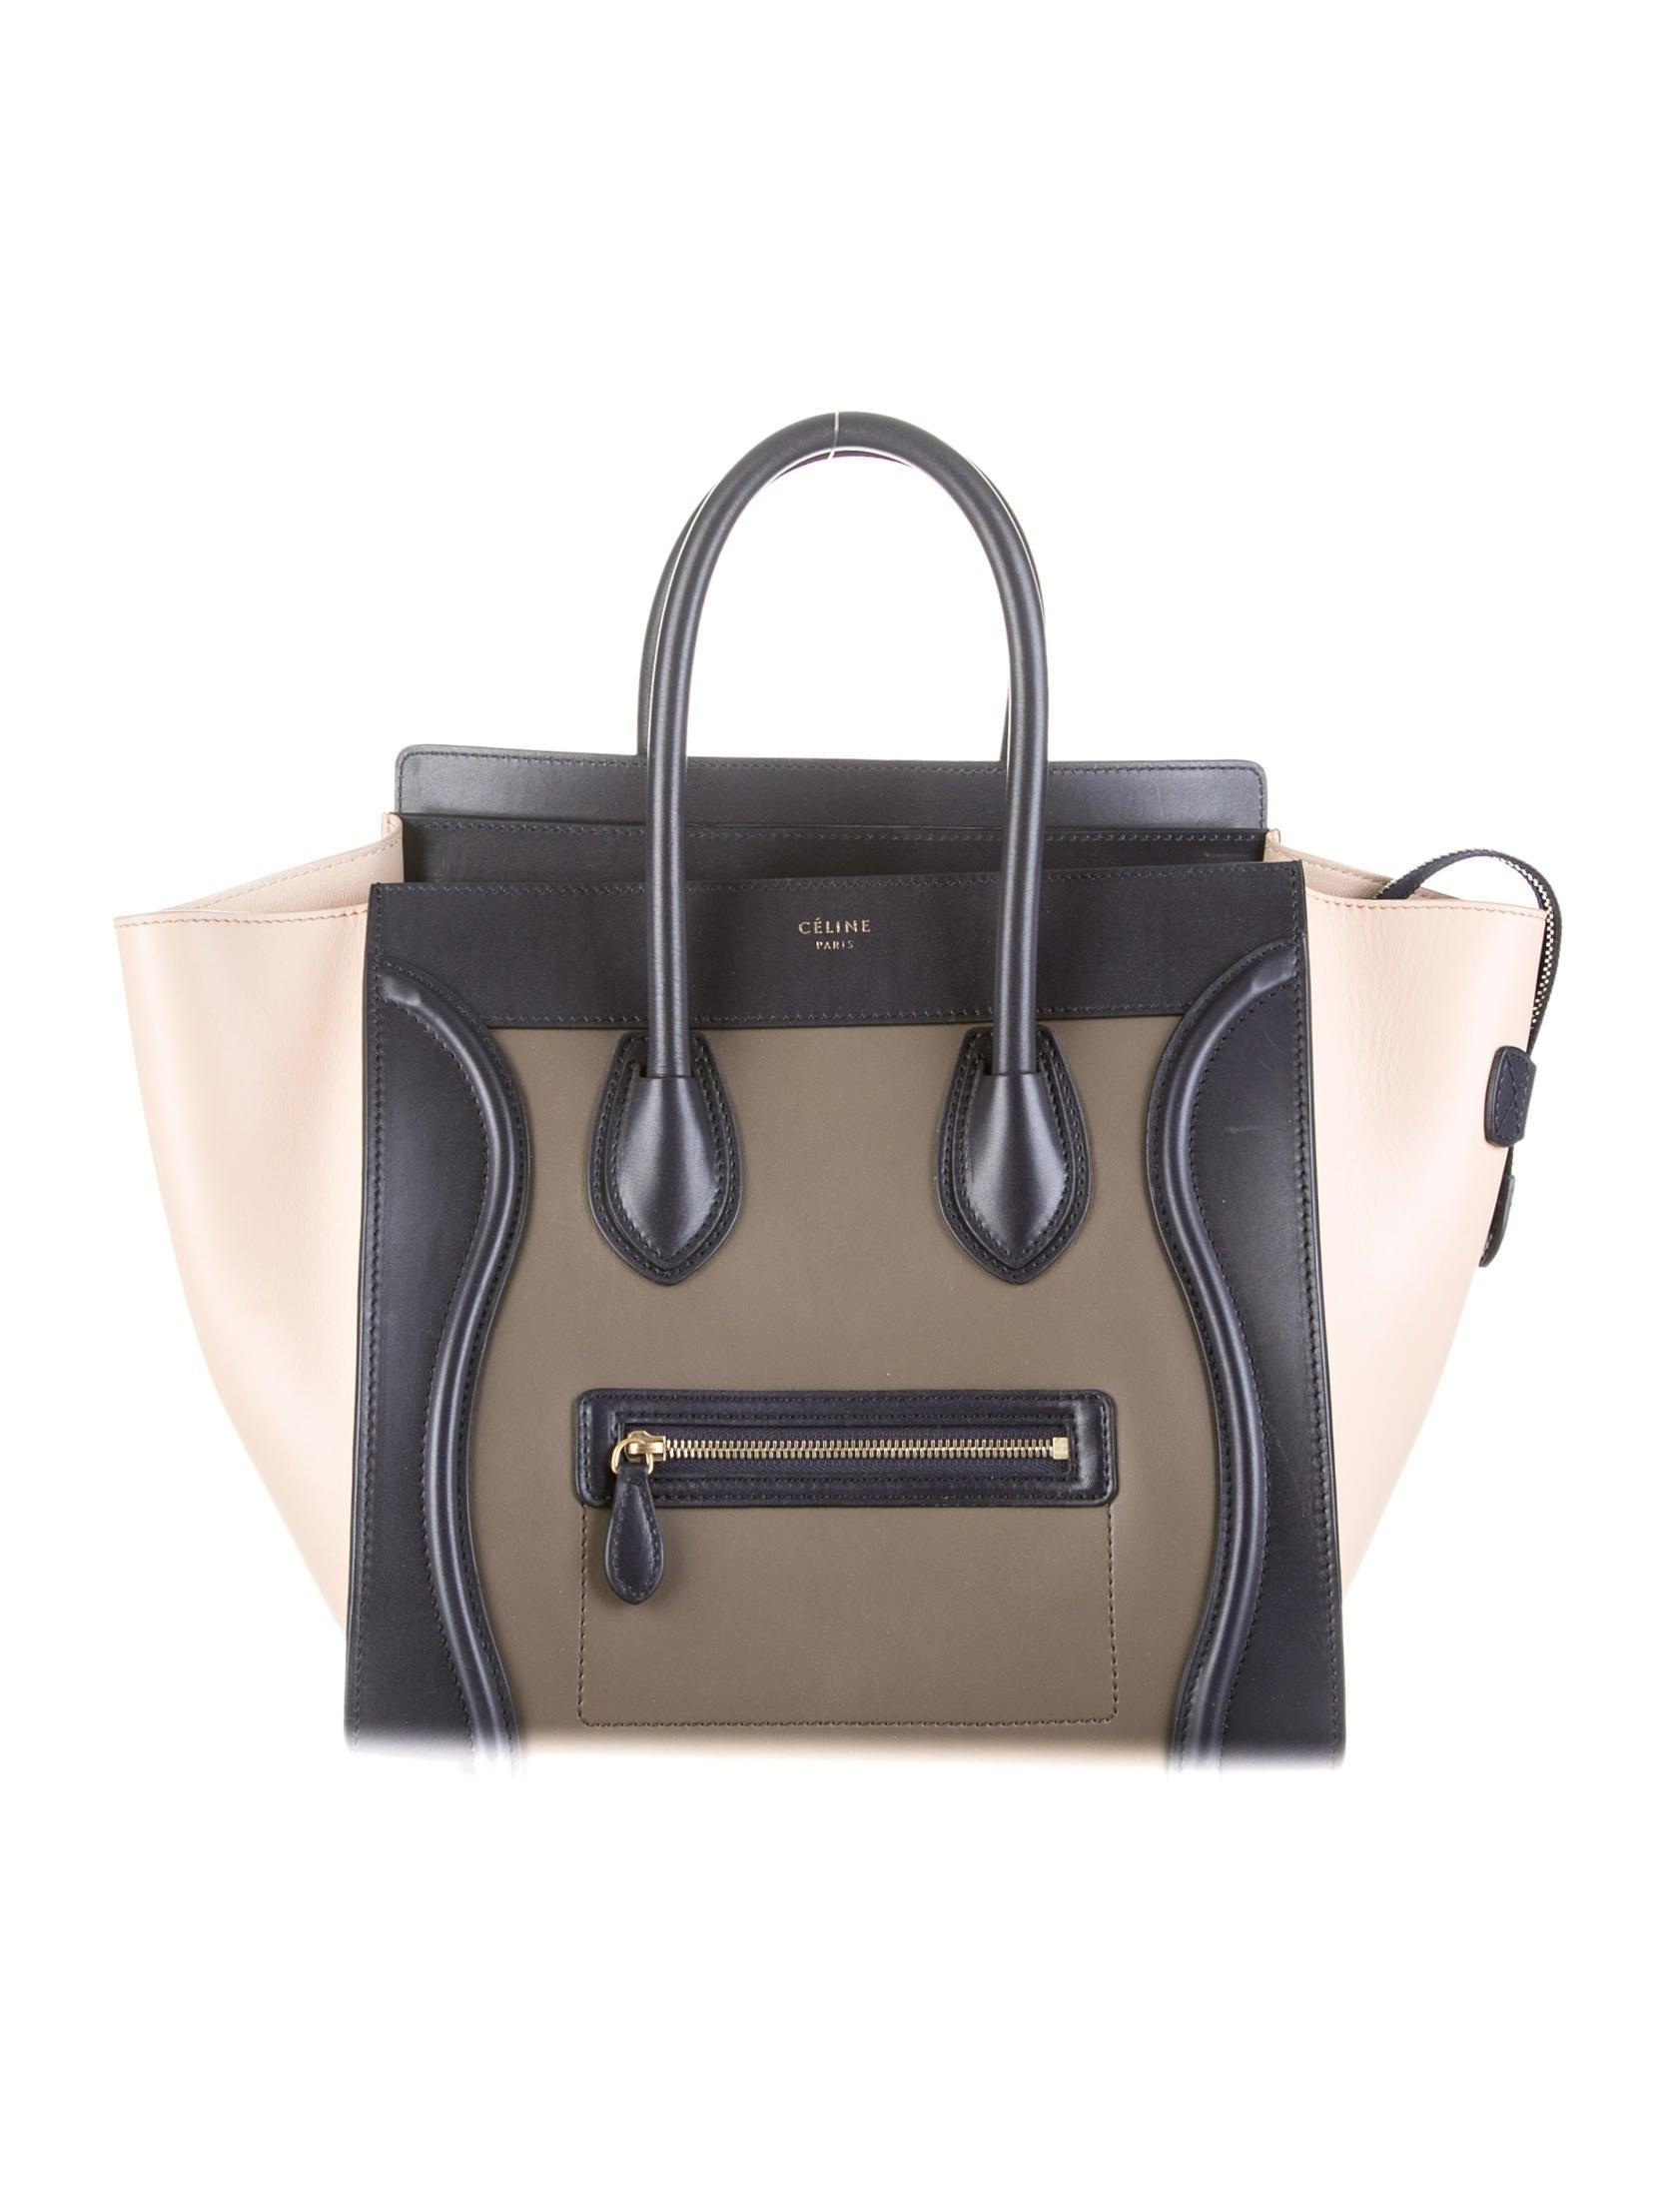 C¨¦line Tricolor Mini Luggage Tote - Handbags - CEL23261   The RealReal